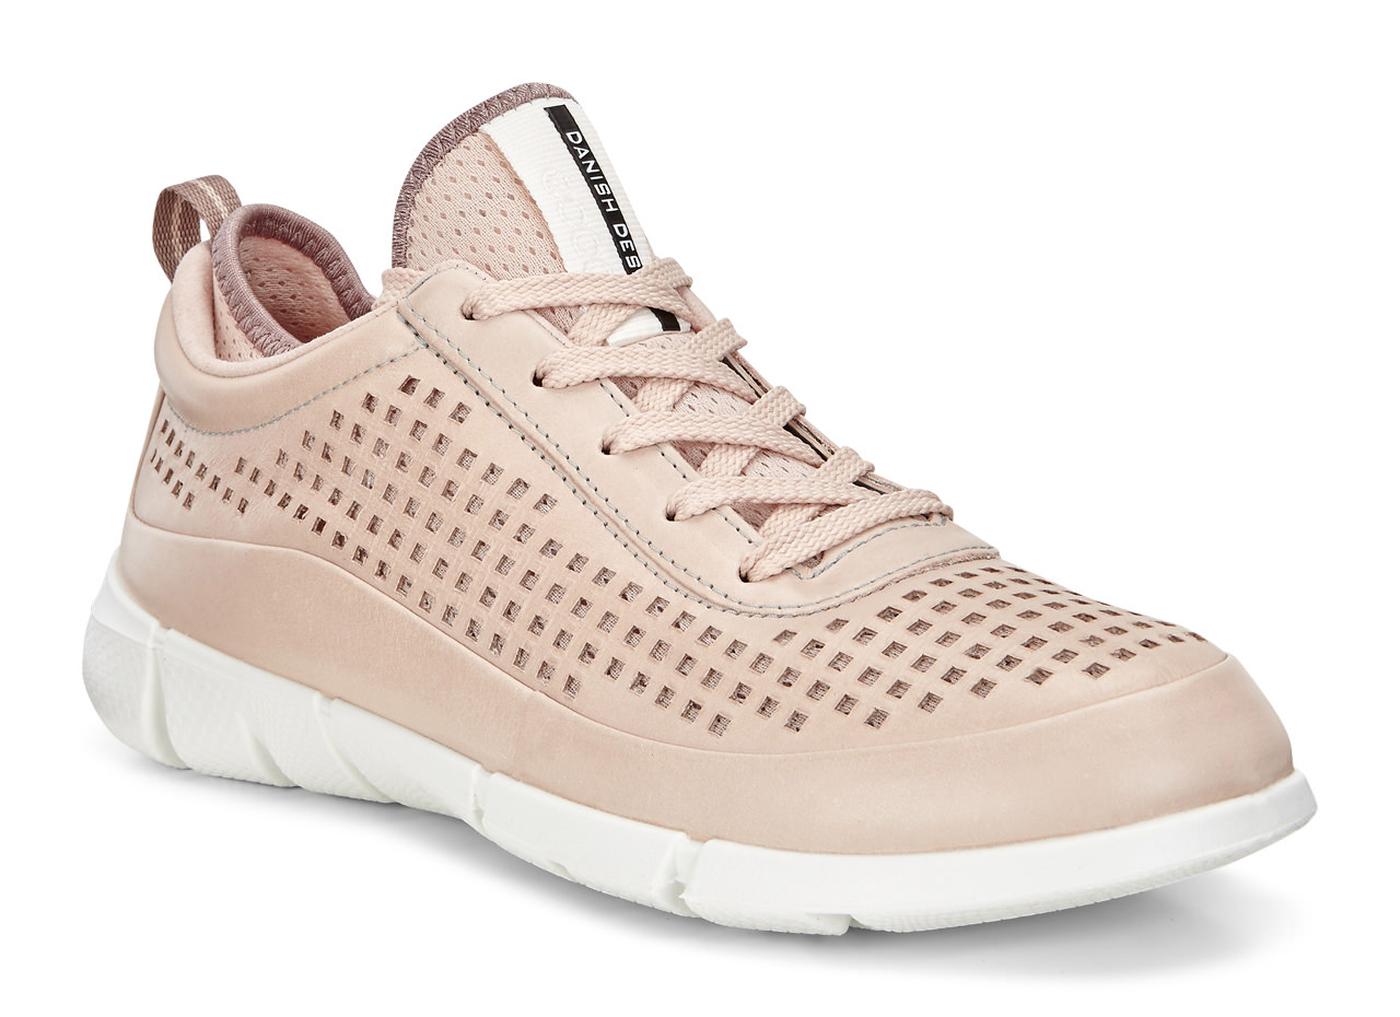 7d615a0aa037 ECCO Womens Intrinsic Sneaker